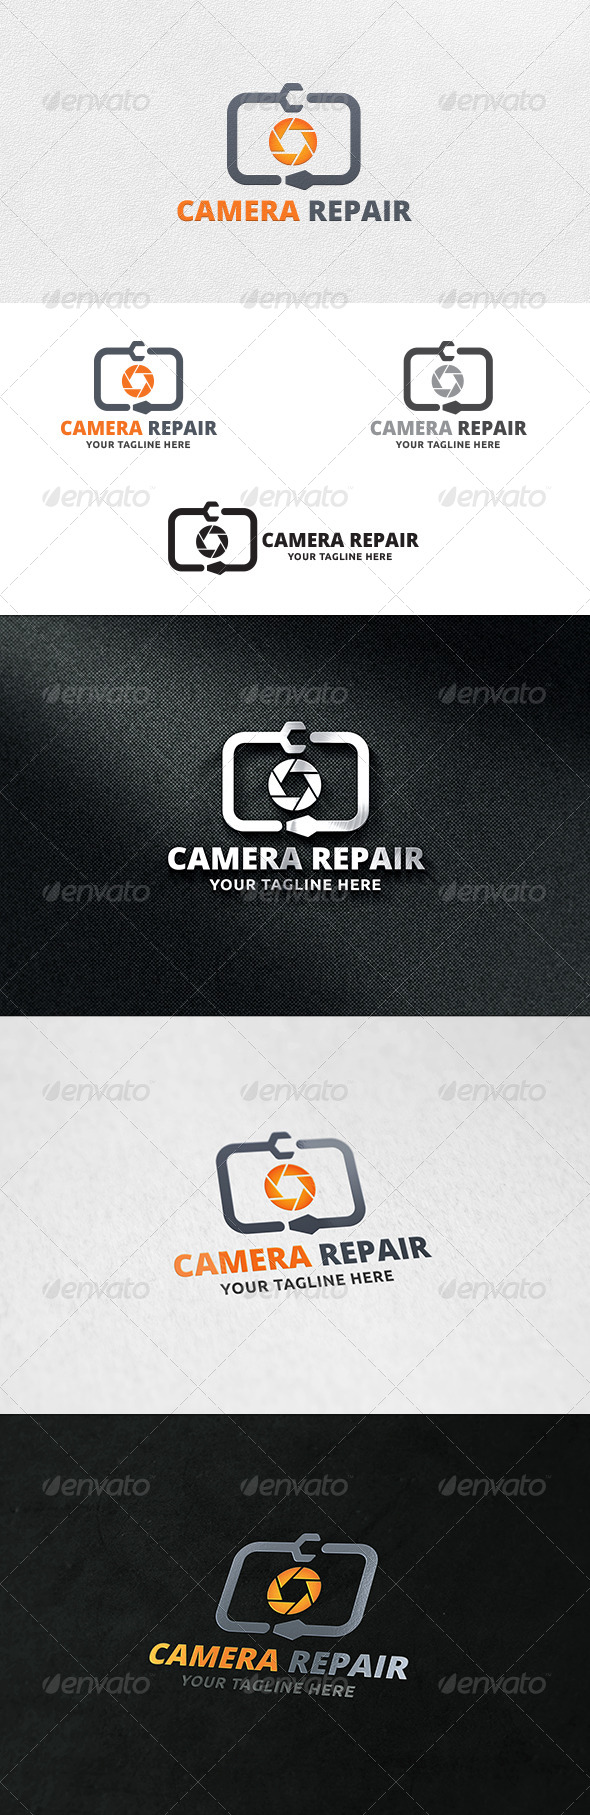 GraphicRiver Camera Repair Logo Template 7113553